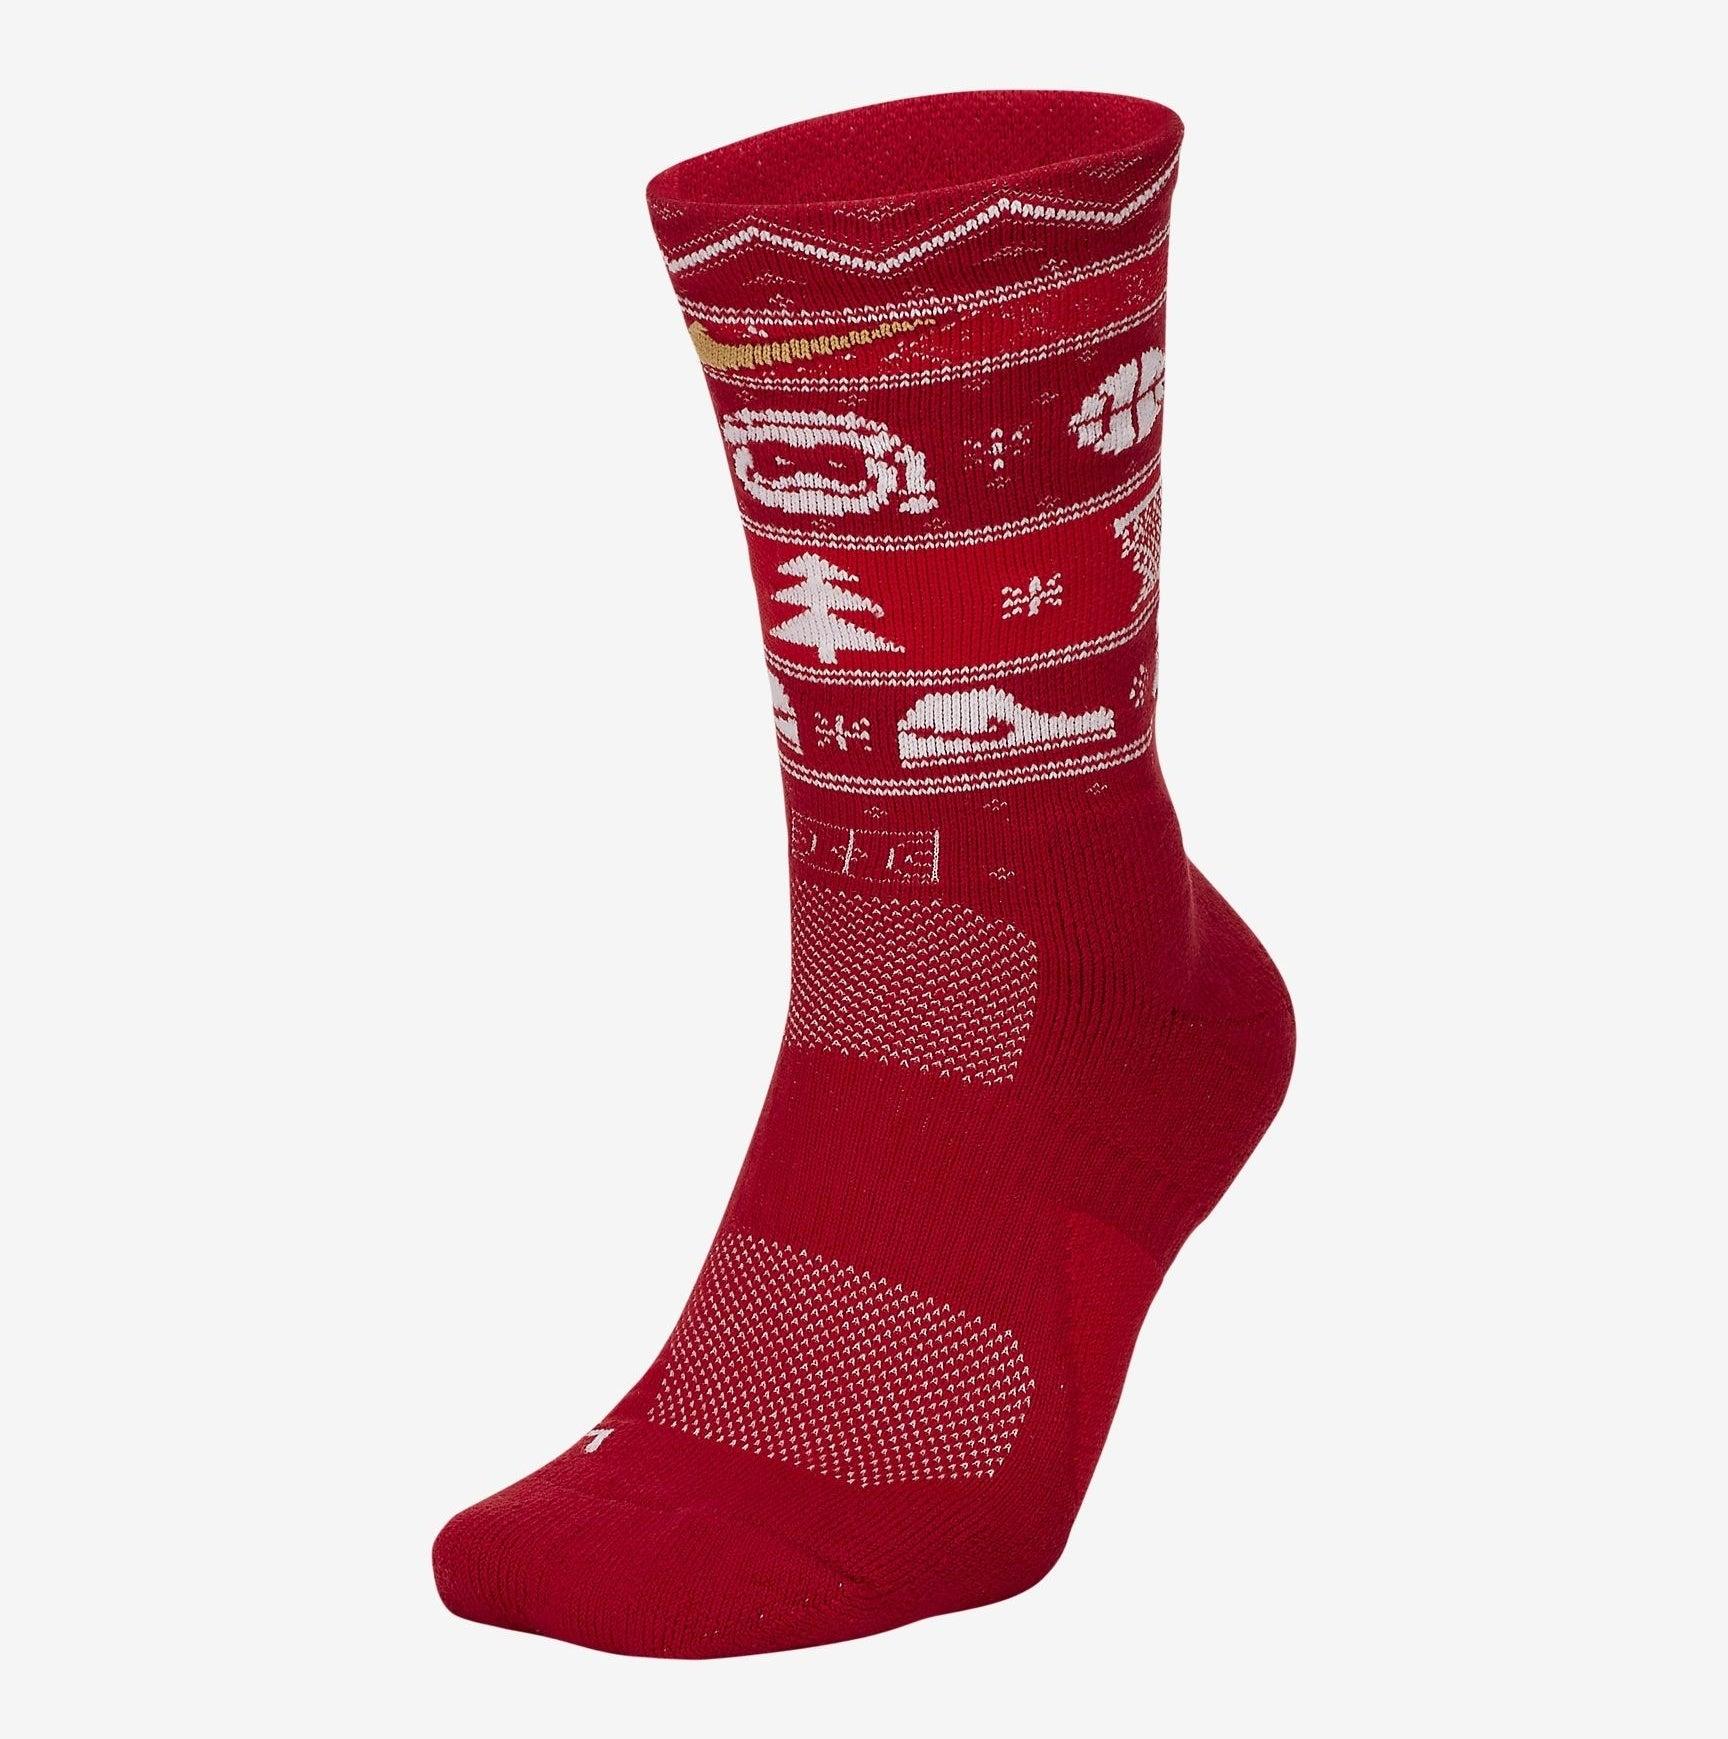 Red elite socks with Christmas basketball iconography